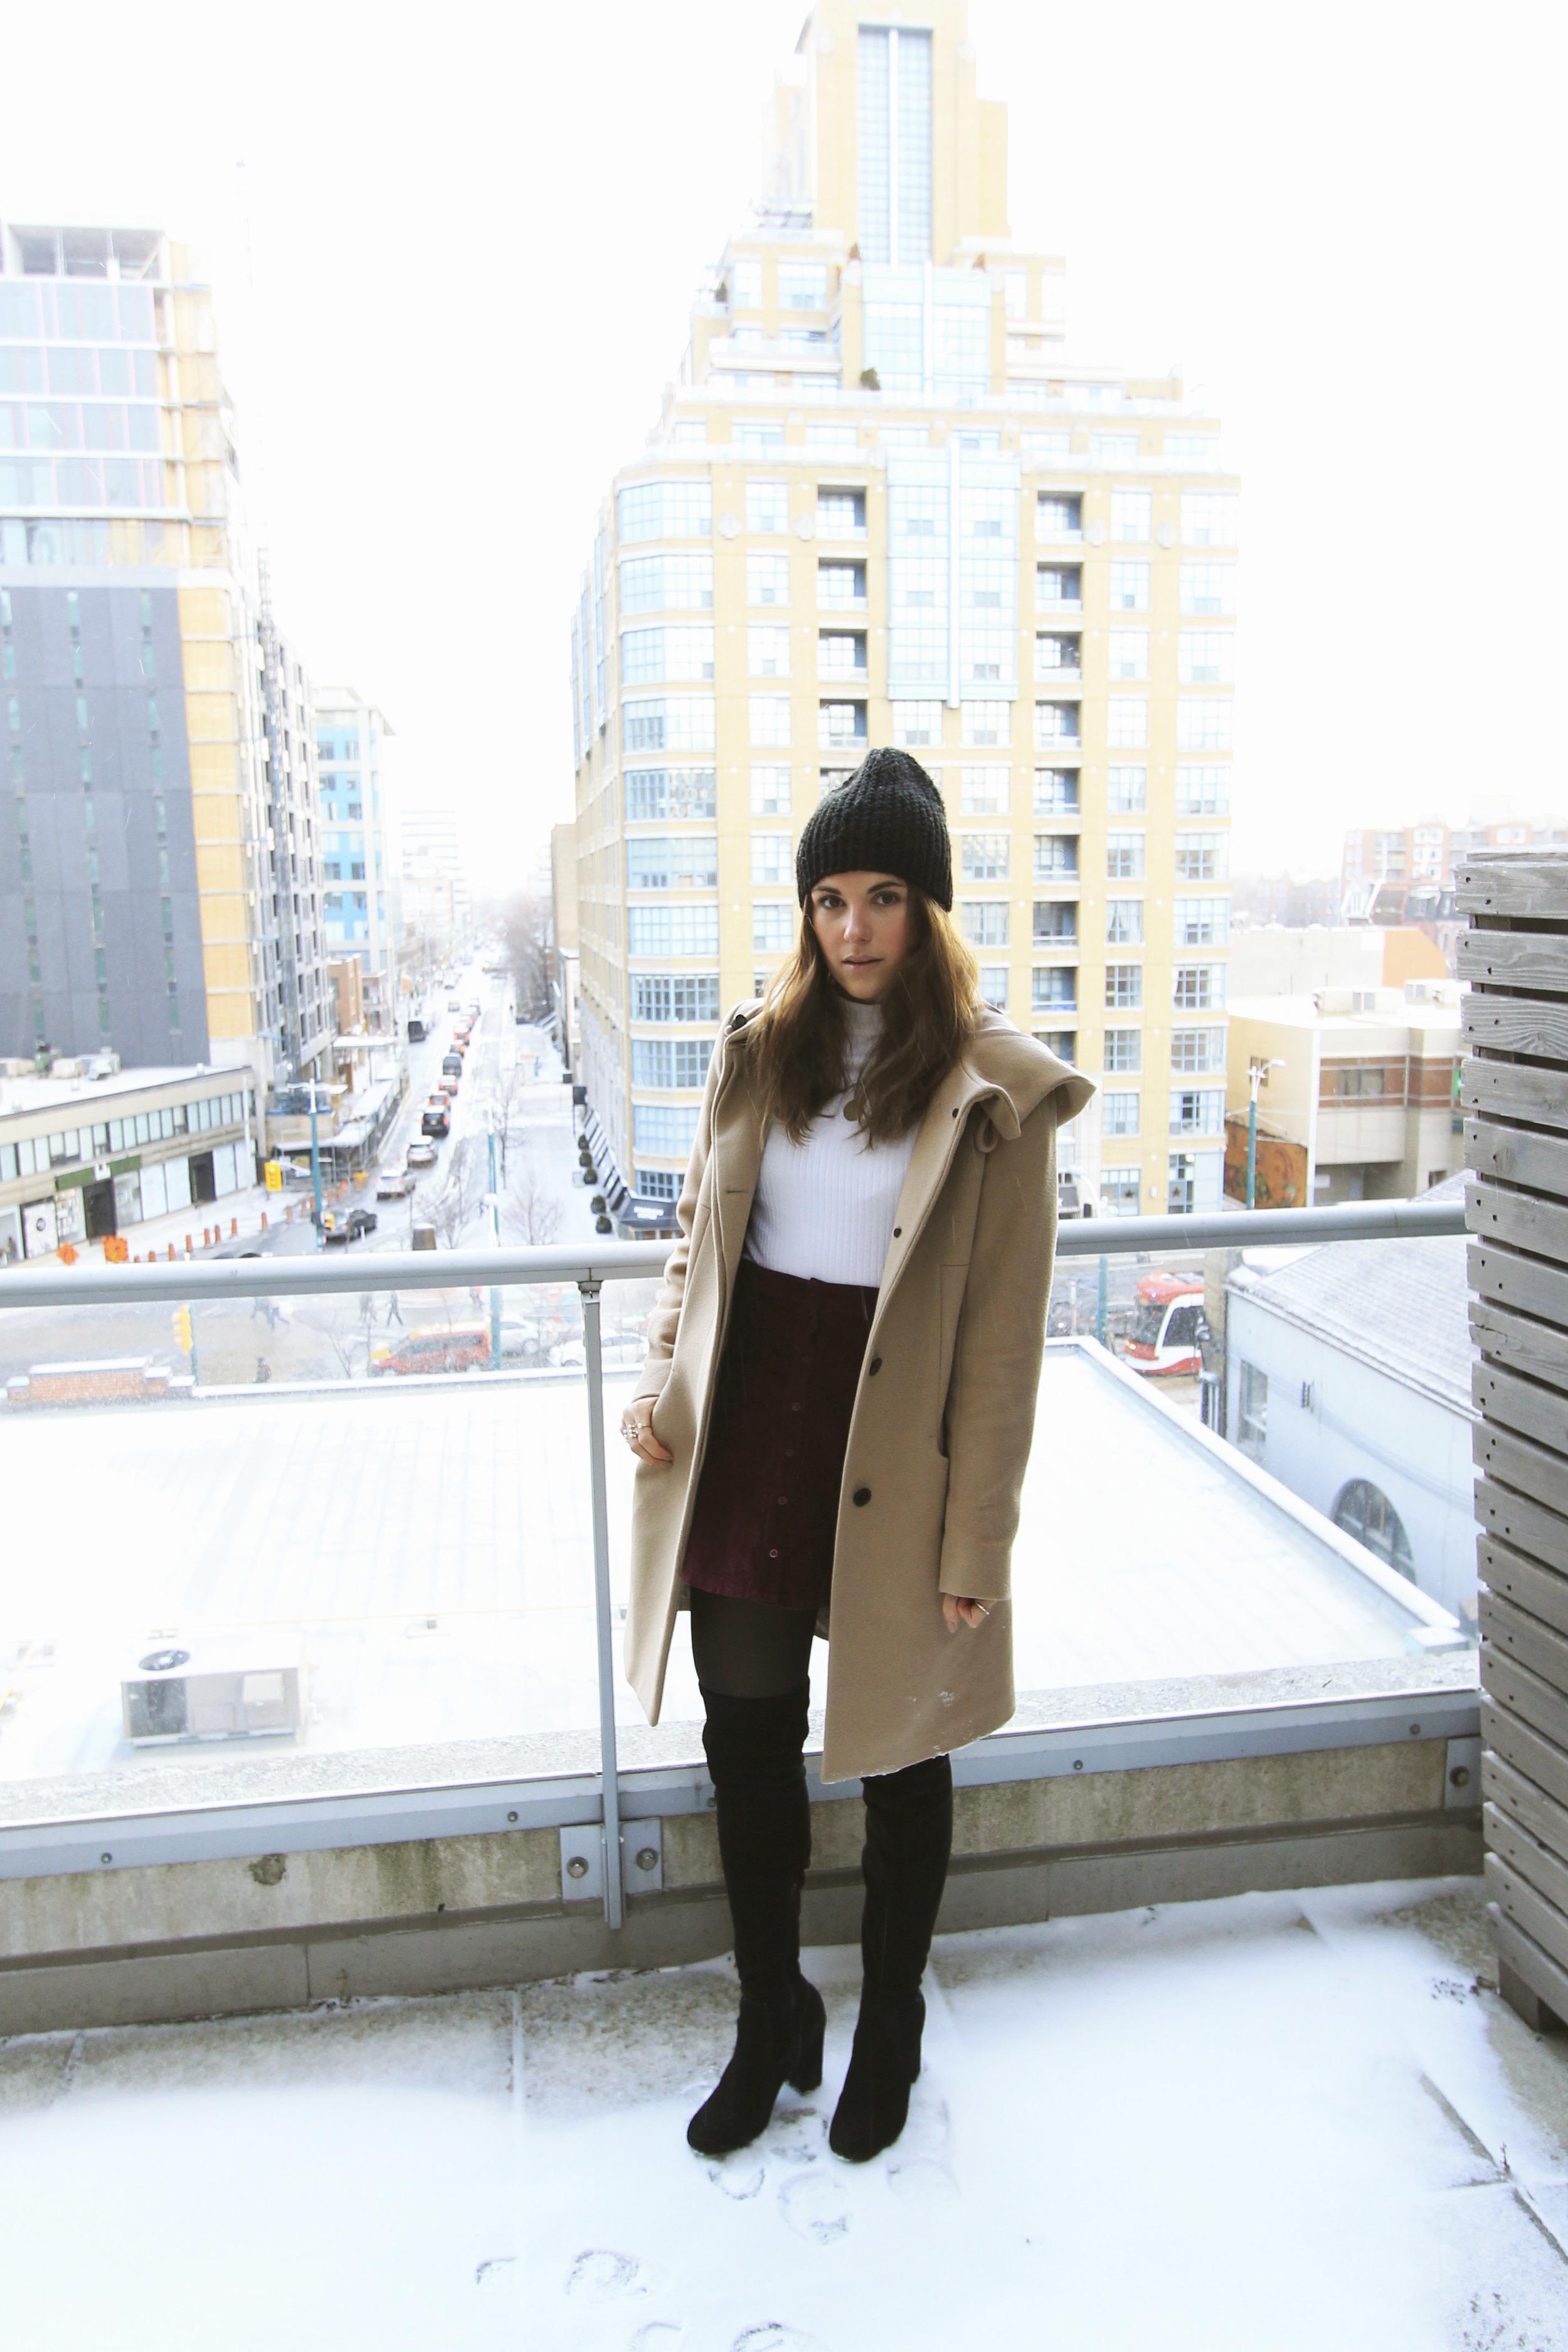 fashion-blogger-toronto-downtown-canadian-winter-february.jpg